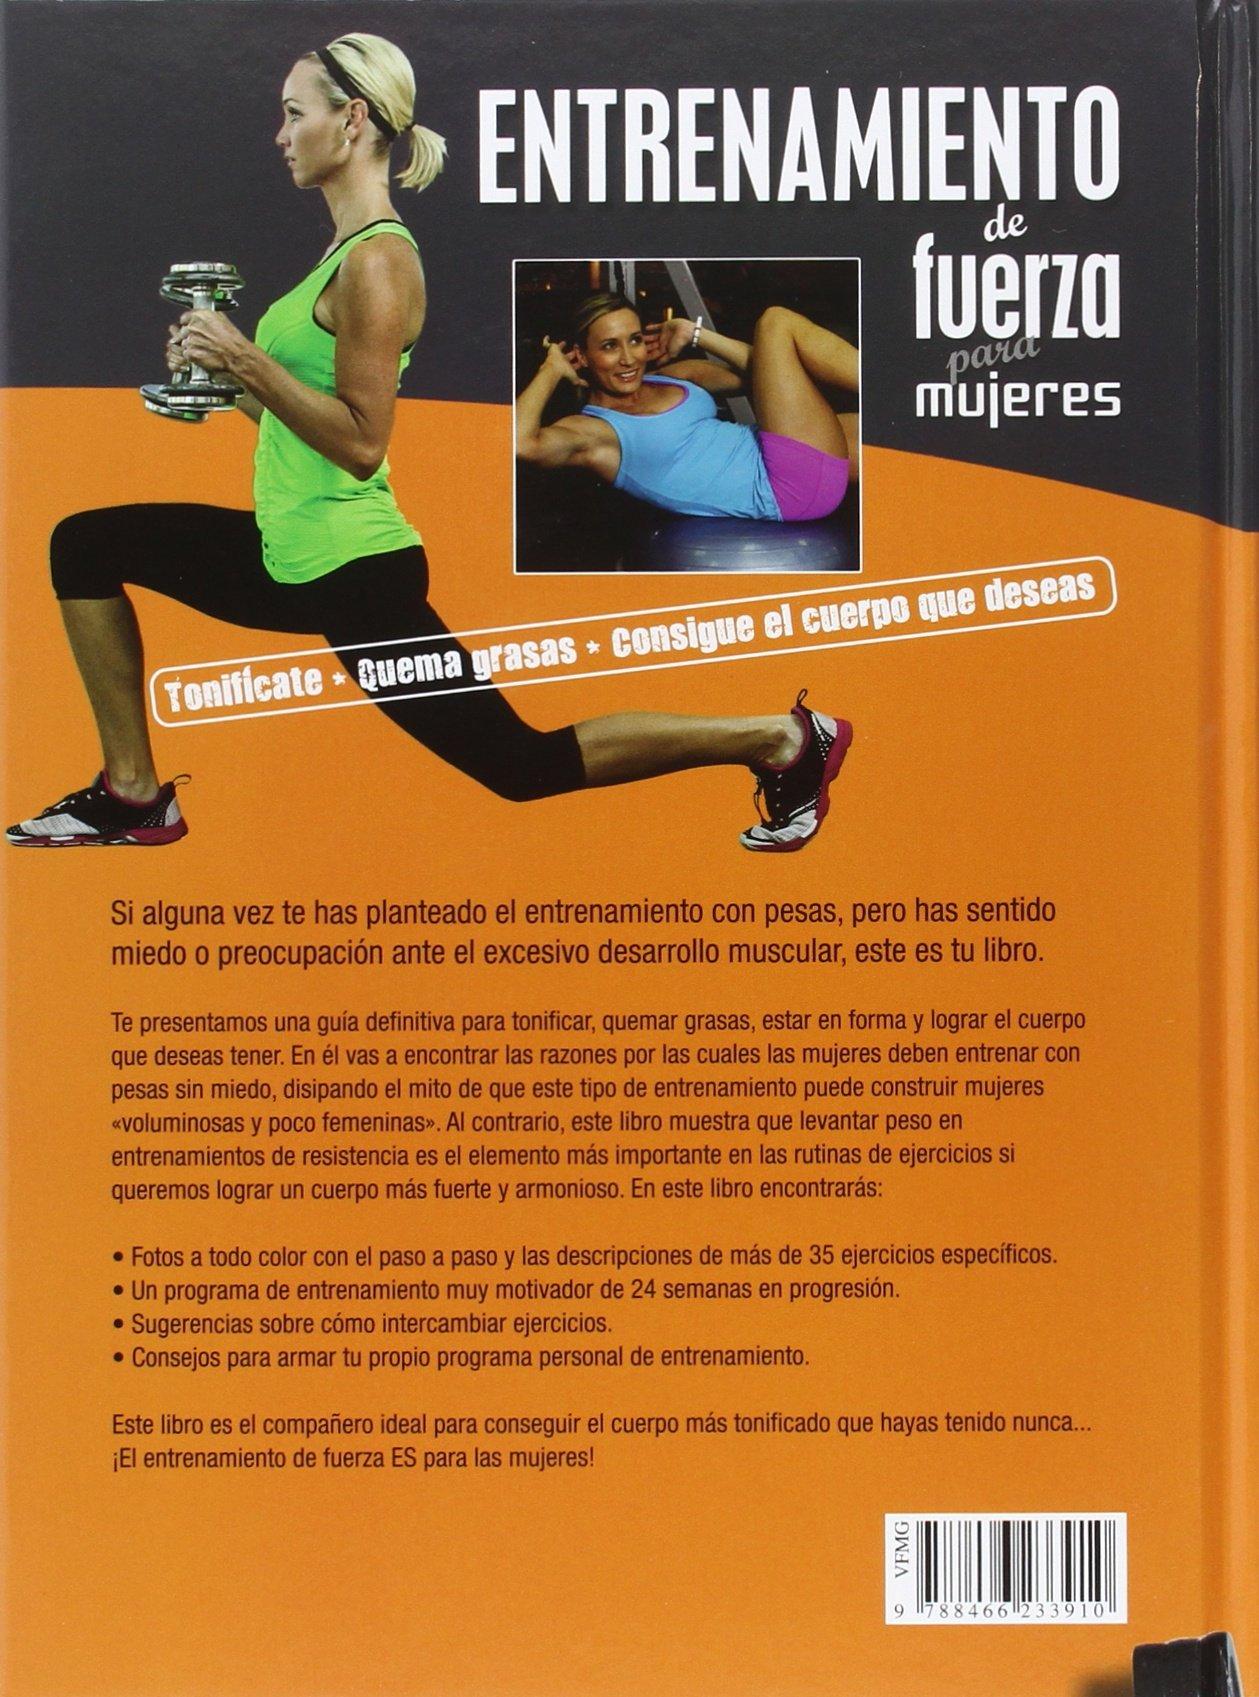 Entrenamiento de fuerza para mujeres (Spanish Edition): John Shepherd, Libsa: 9788466233910: Amazon.com: Books